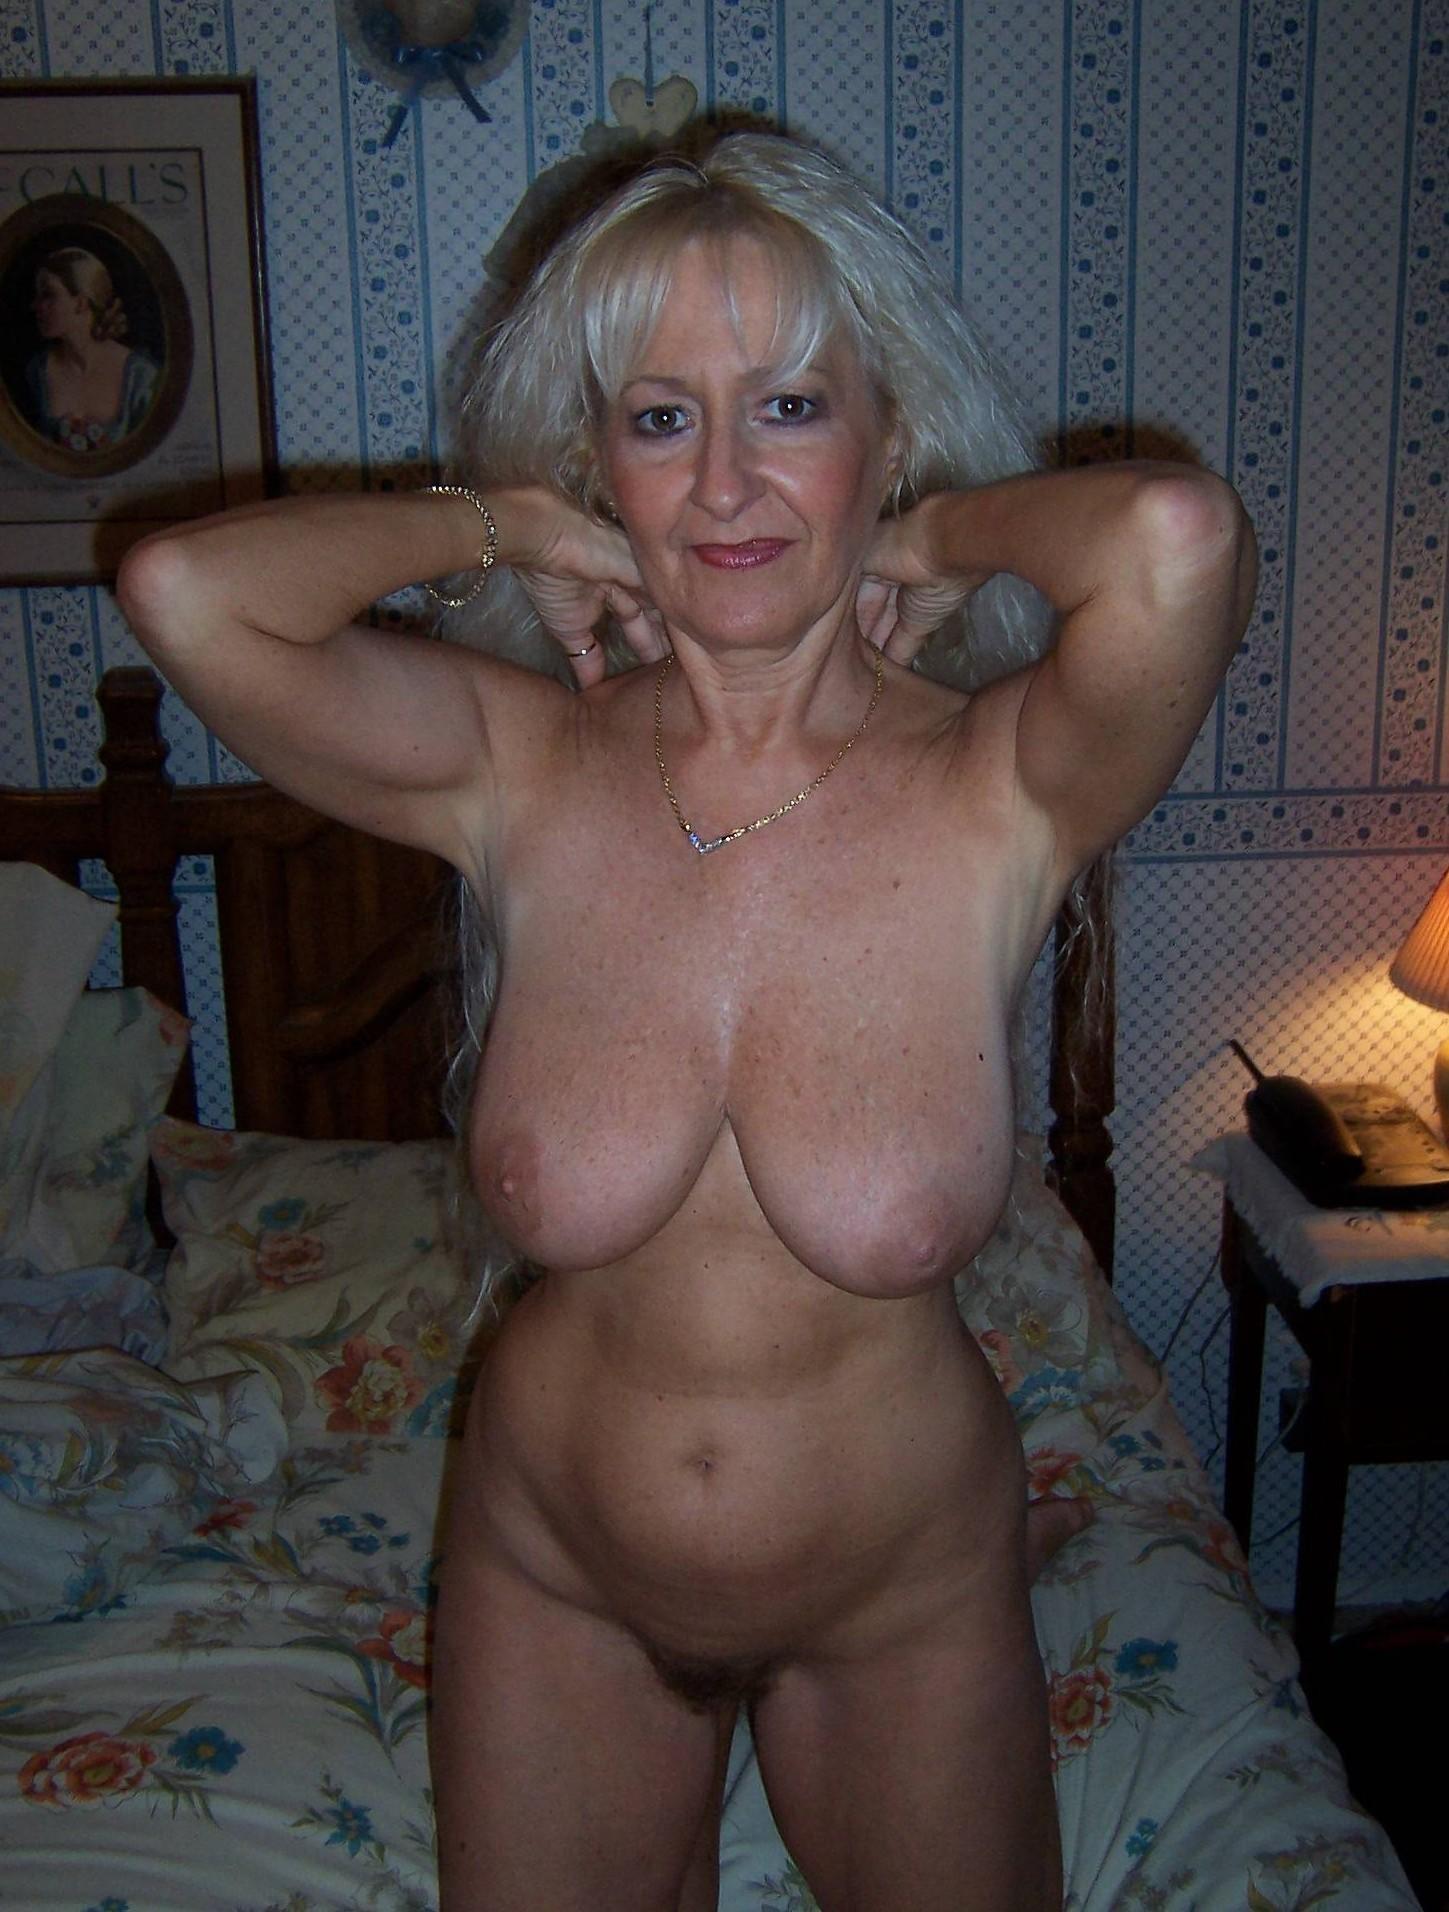 Amateur Mature Mom Porn mommy mature porn enticing hot mature mom porn amateur